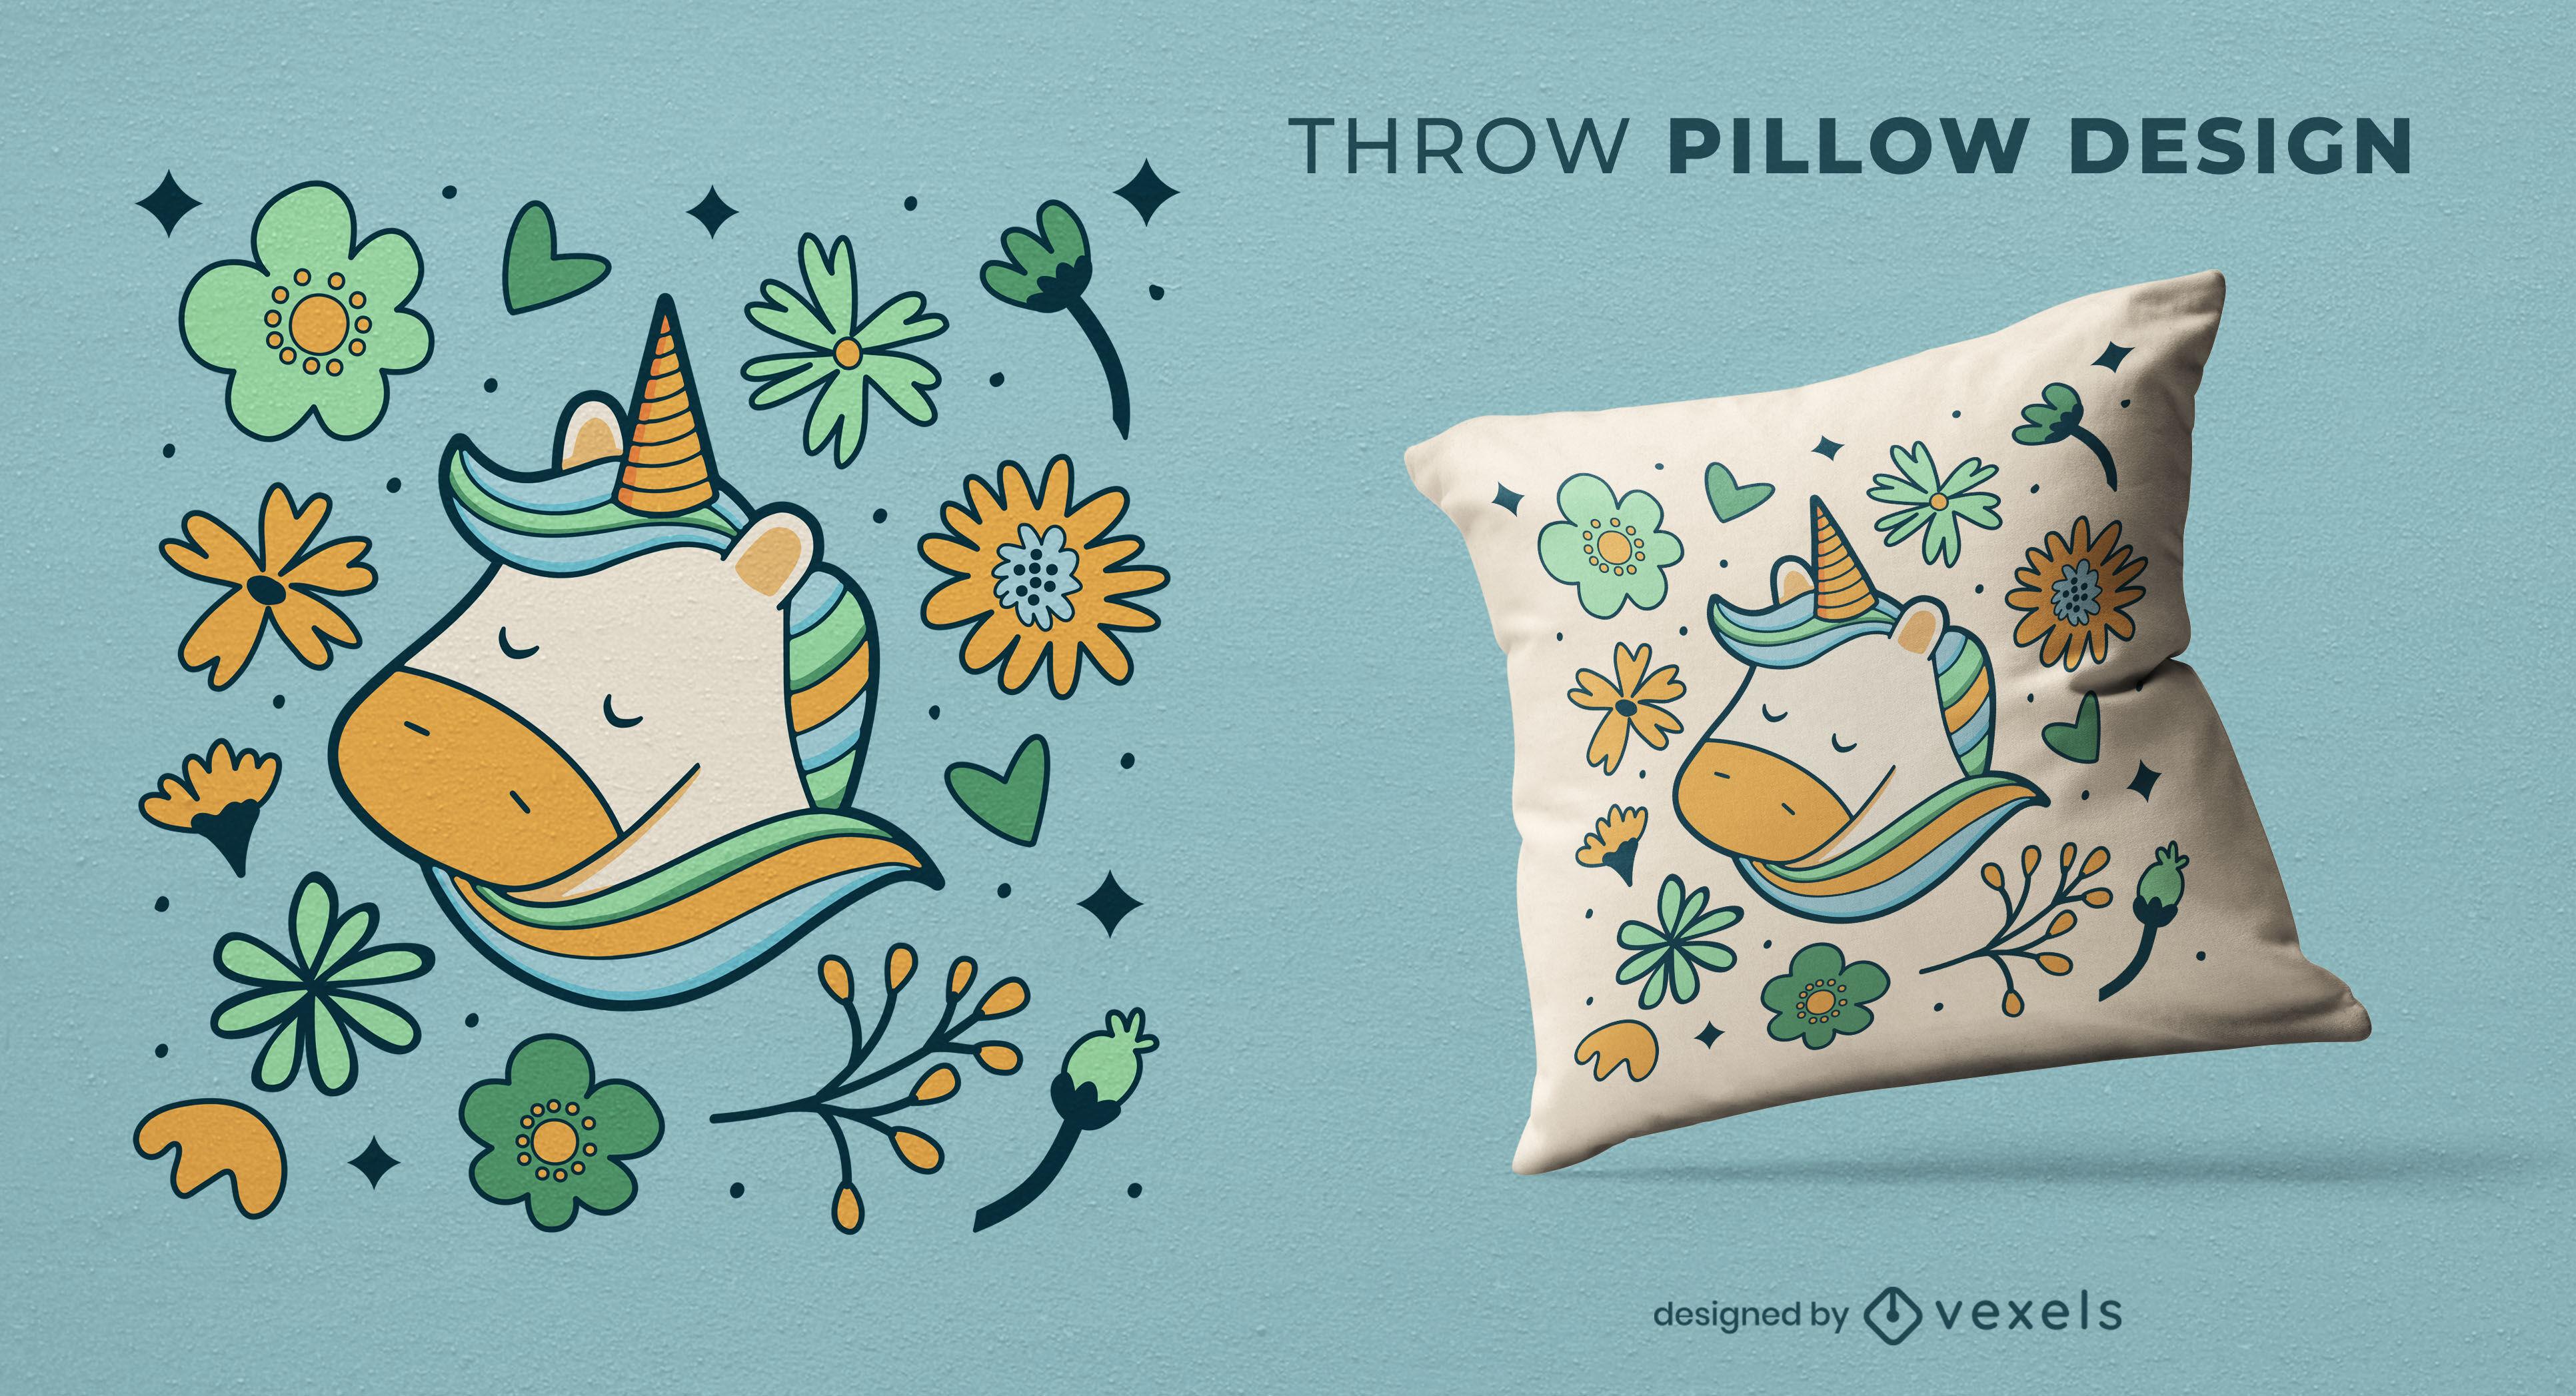 Diseño de almohada de tiro de flores de unicornio feliz